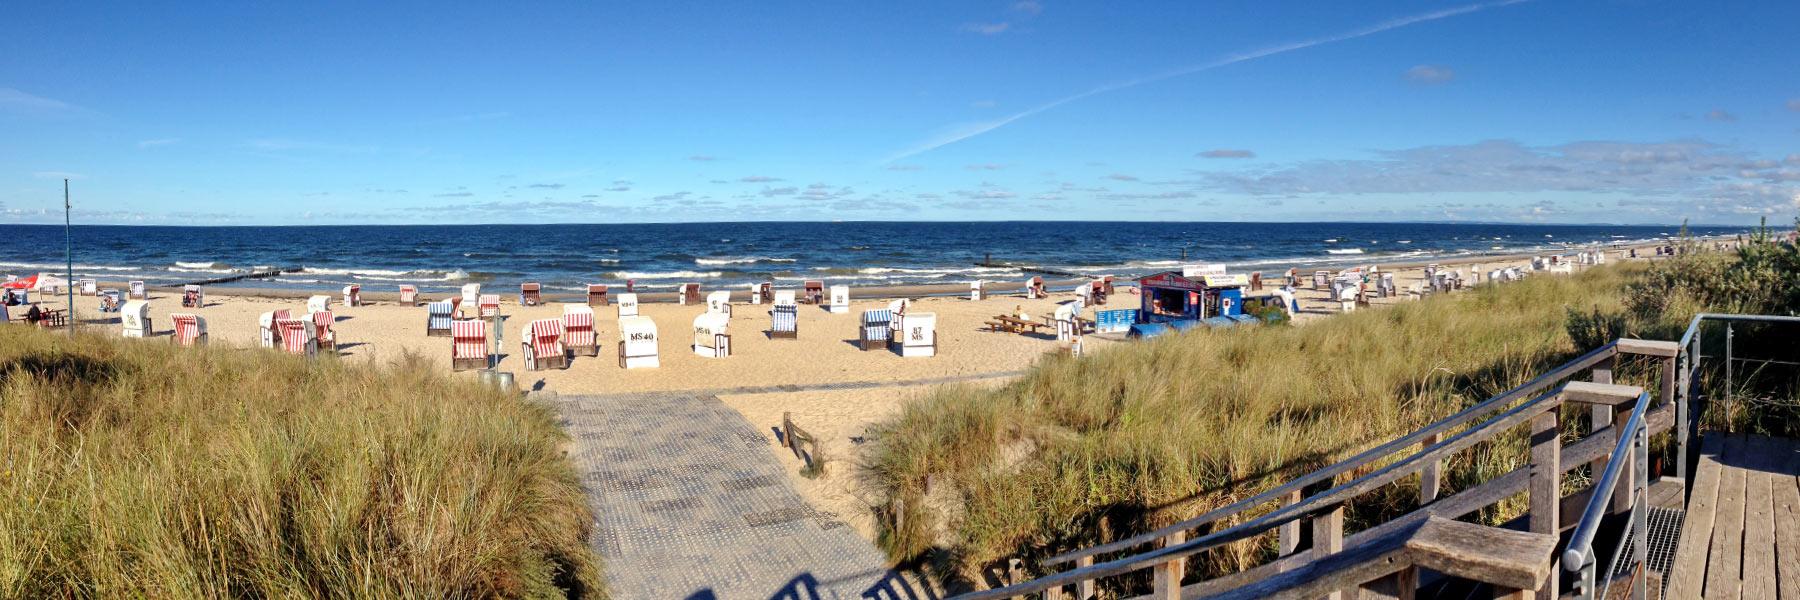 Strandzugang - Seebad Ückeritz